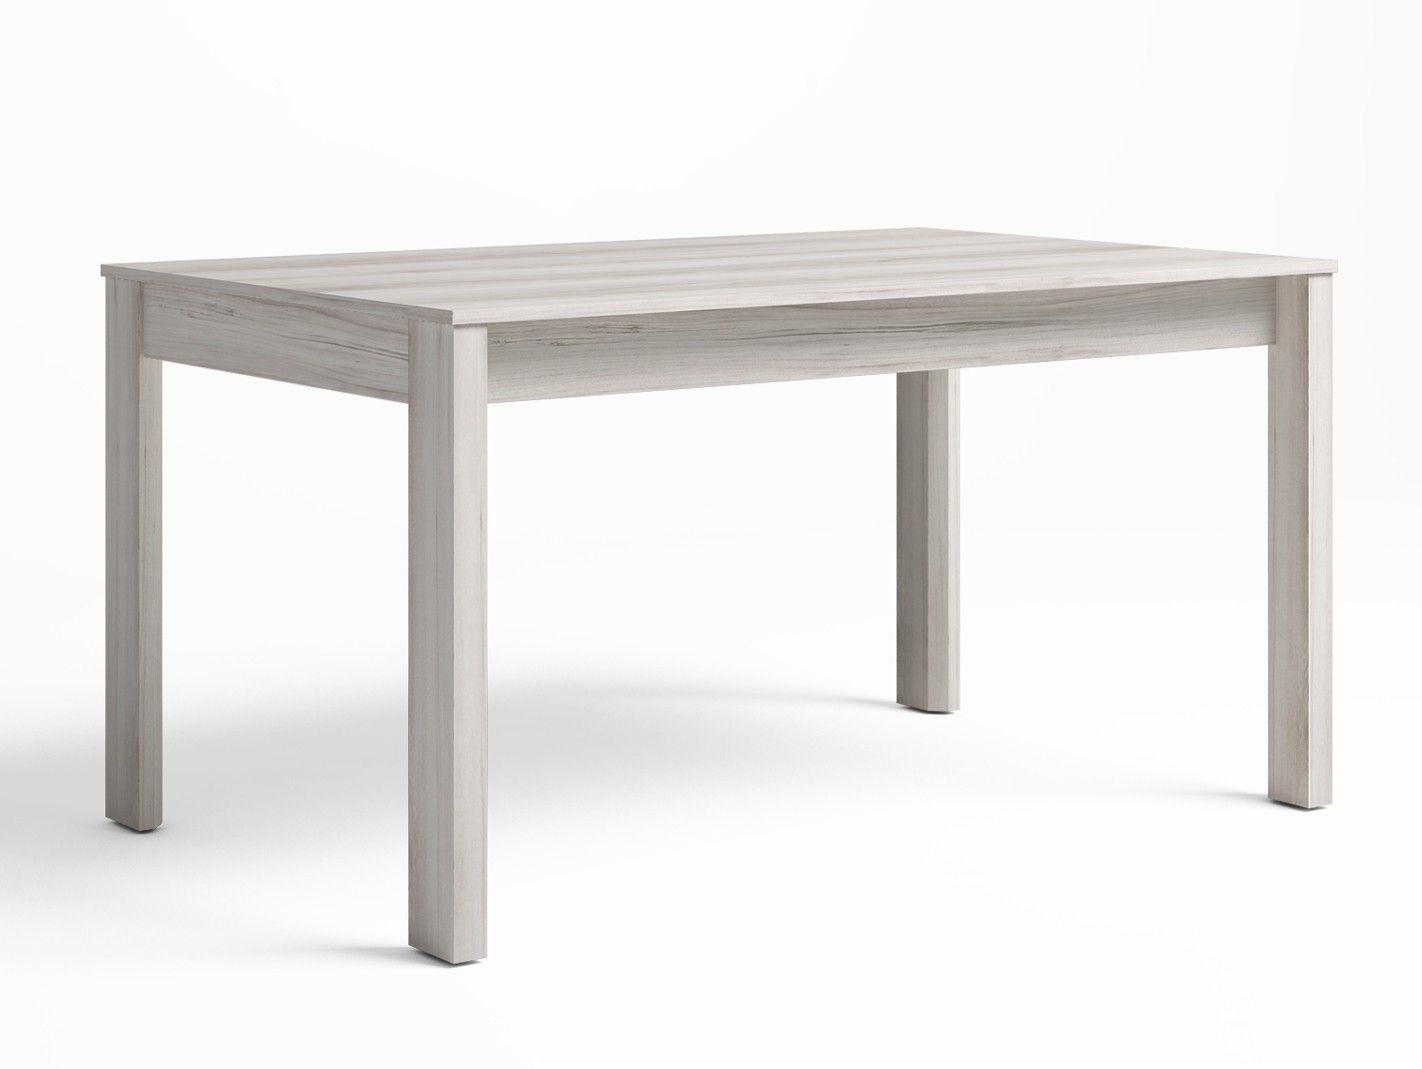 Mesa baja de salon adems me parece muy til porque tiene for Como decorar una mesa baja de salon